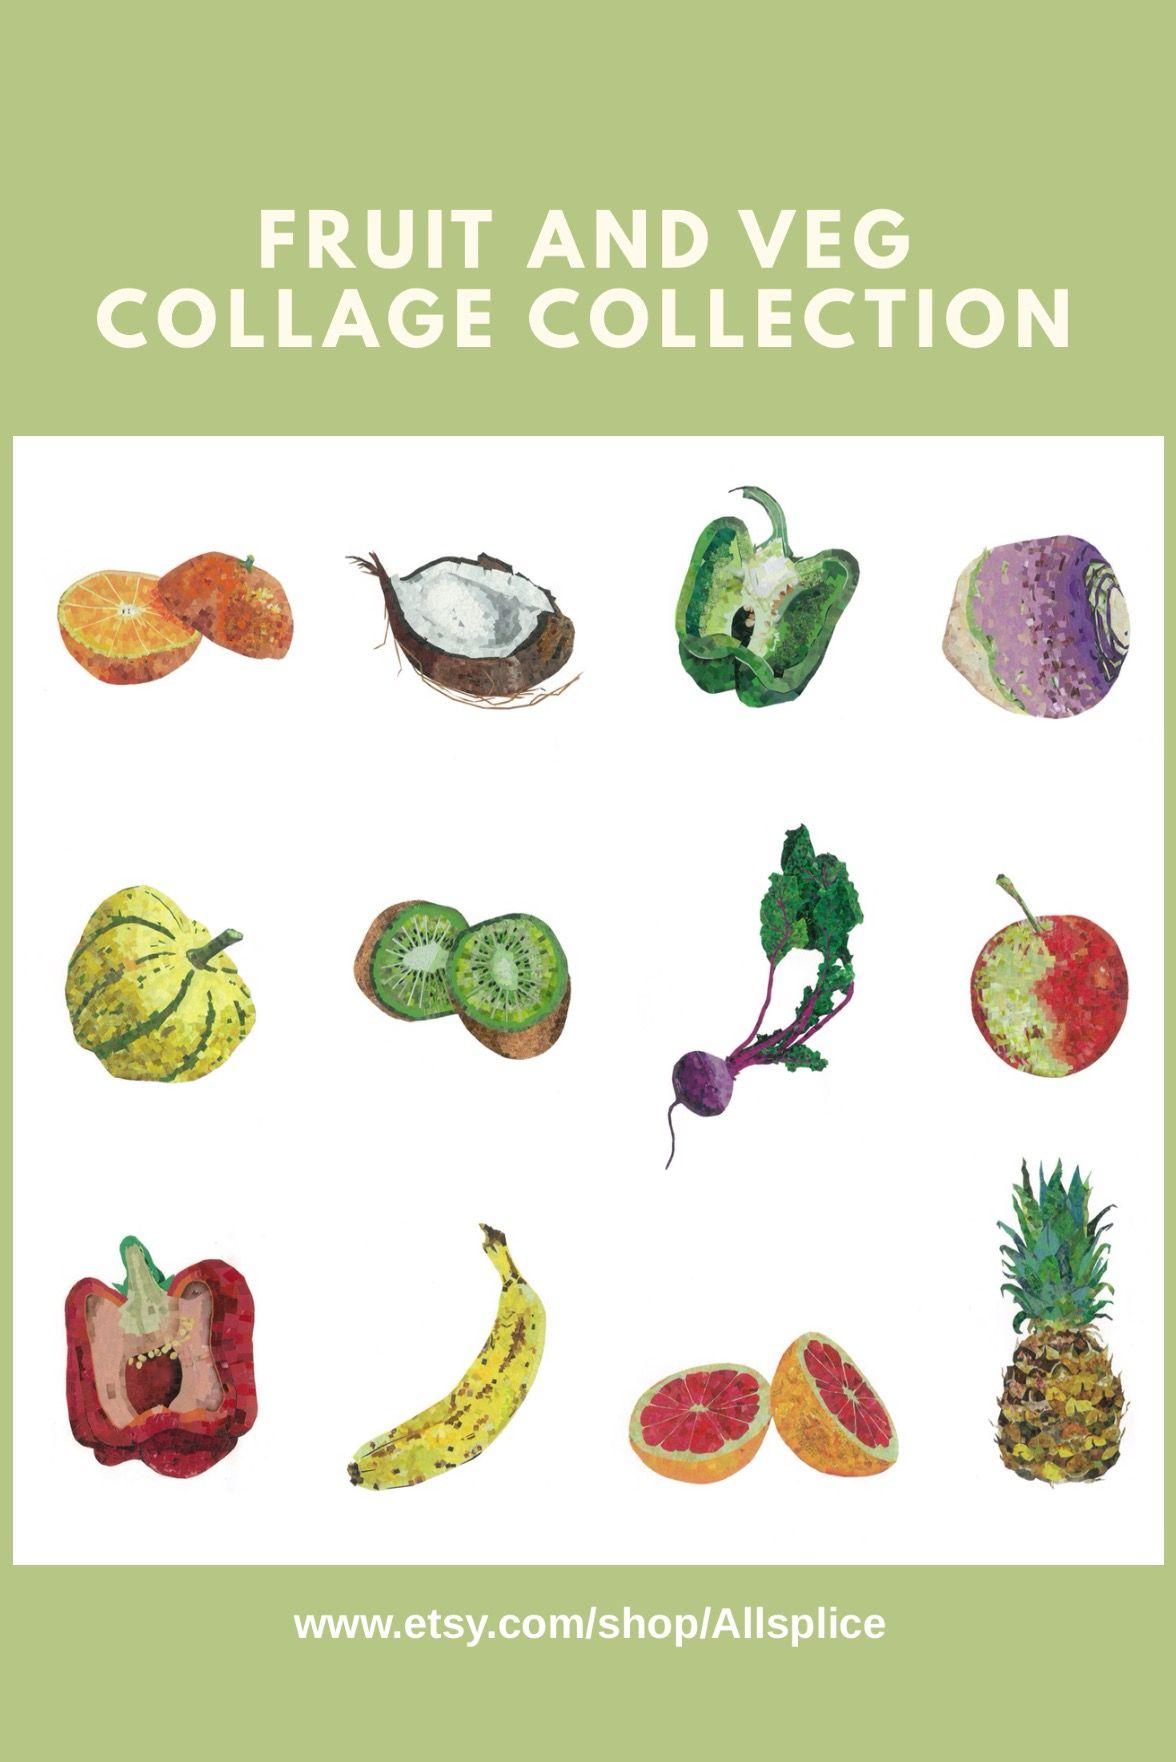 c425181f598cc Fruit and vegetable collection - Pop Art pixel fine art collage ...